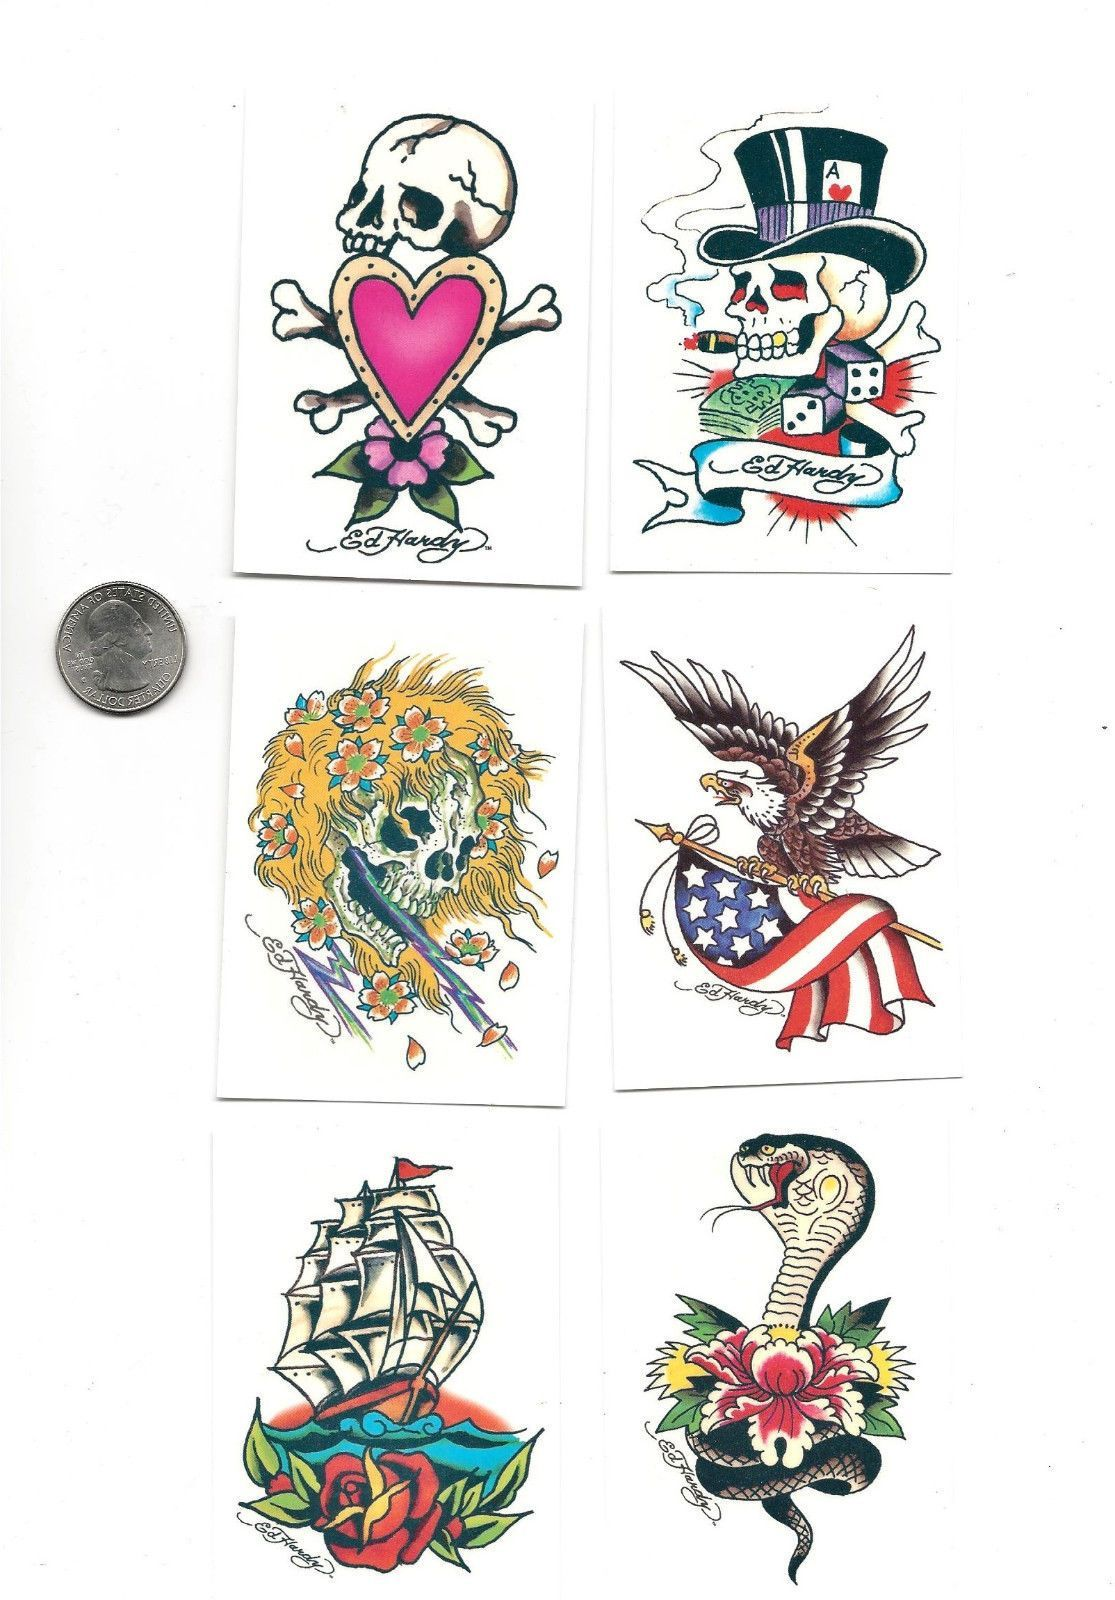 Details about 6 Ed Hardy Classic Designs Skulls Flag Celebrity Art ...